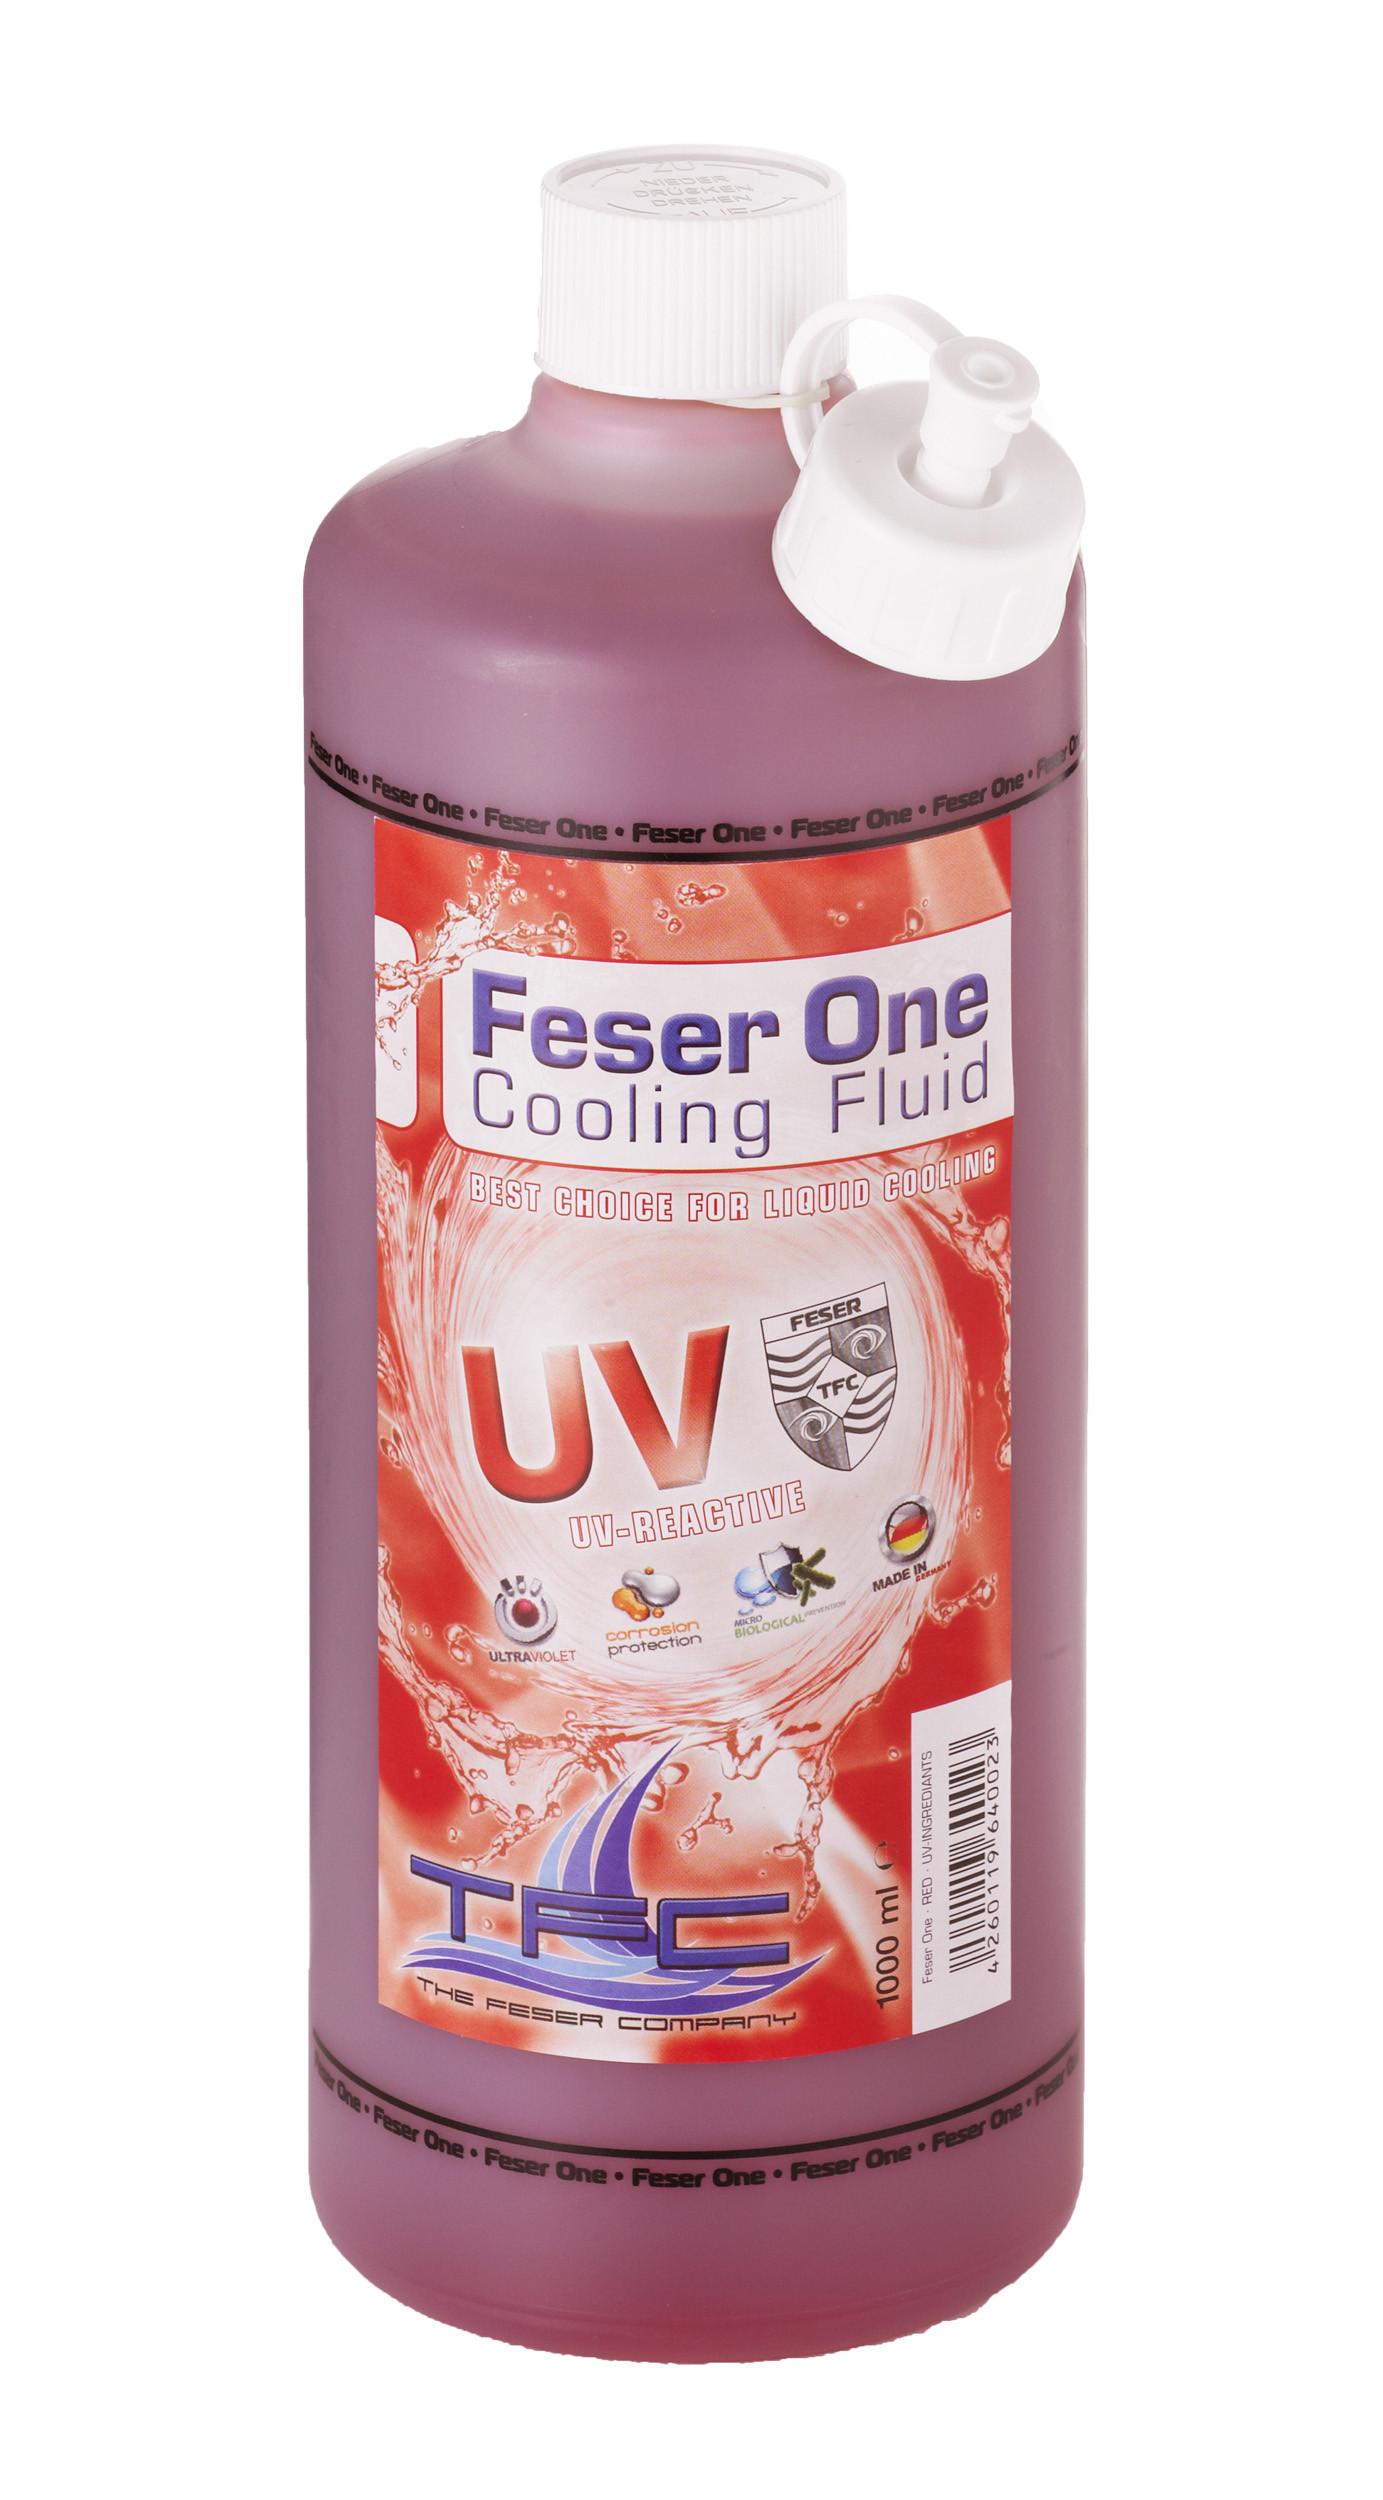 liquide de protection feser one cooling fluid r actif aux uv rouge 1 litre the feser company. Black Bedroom Furniture Sets. Home Design Ideas